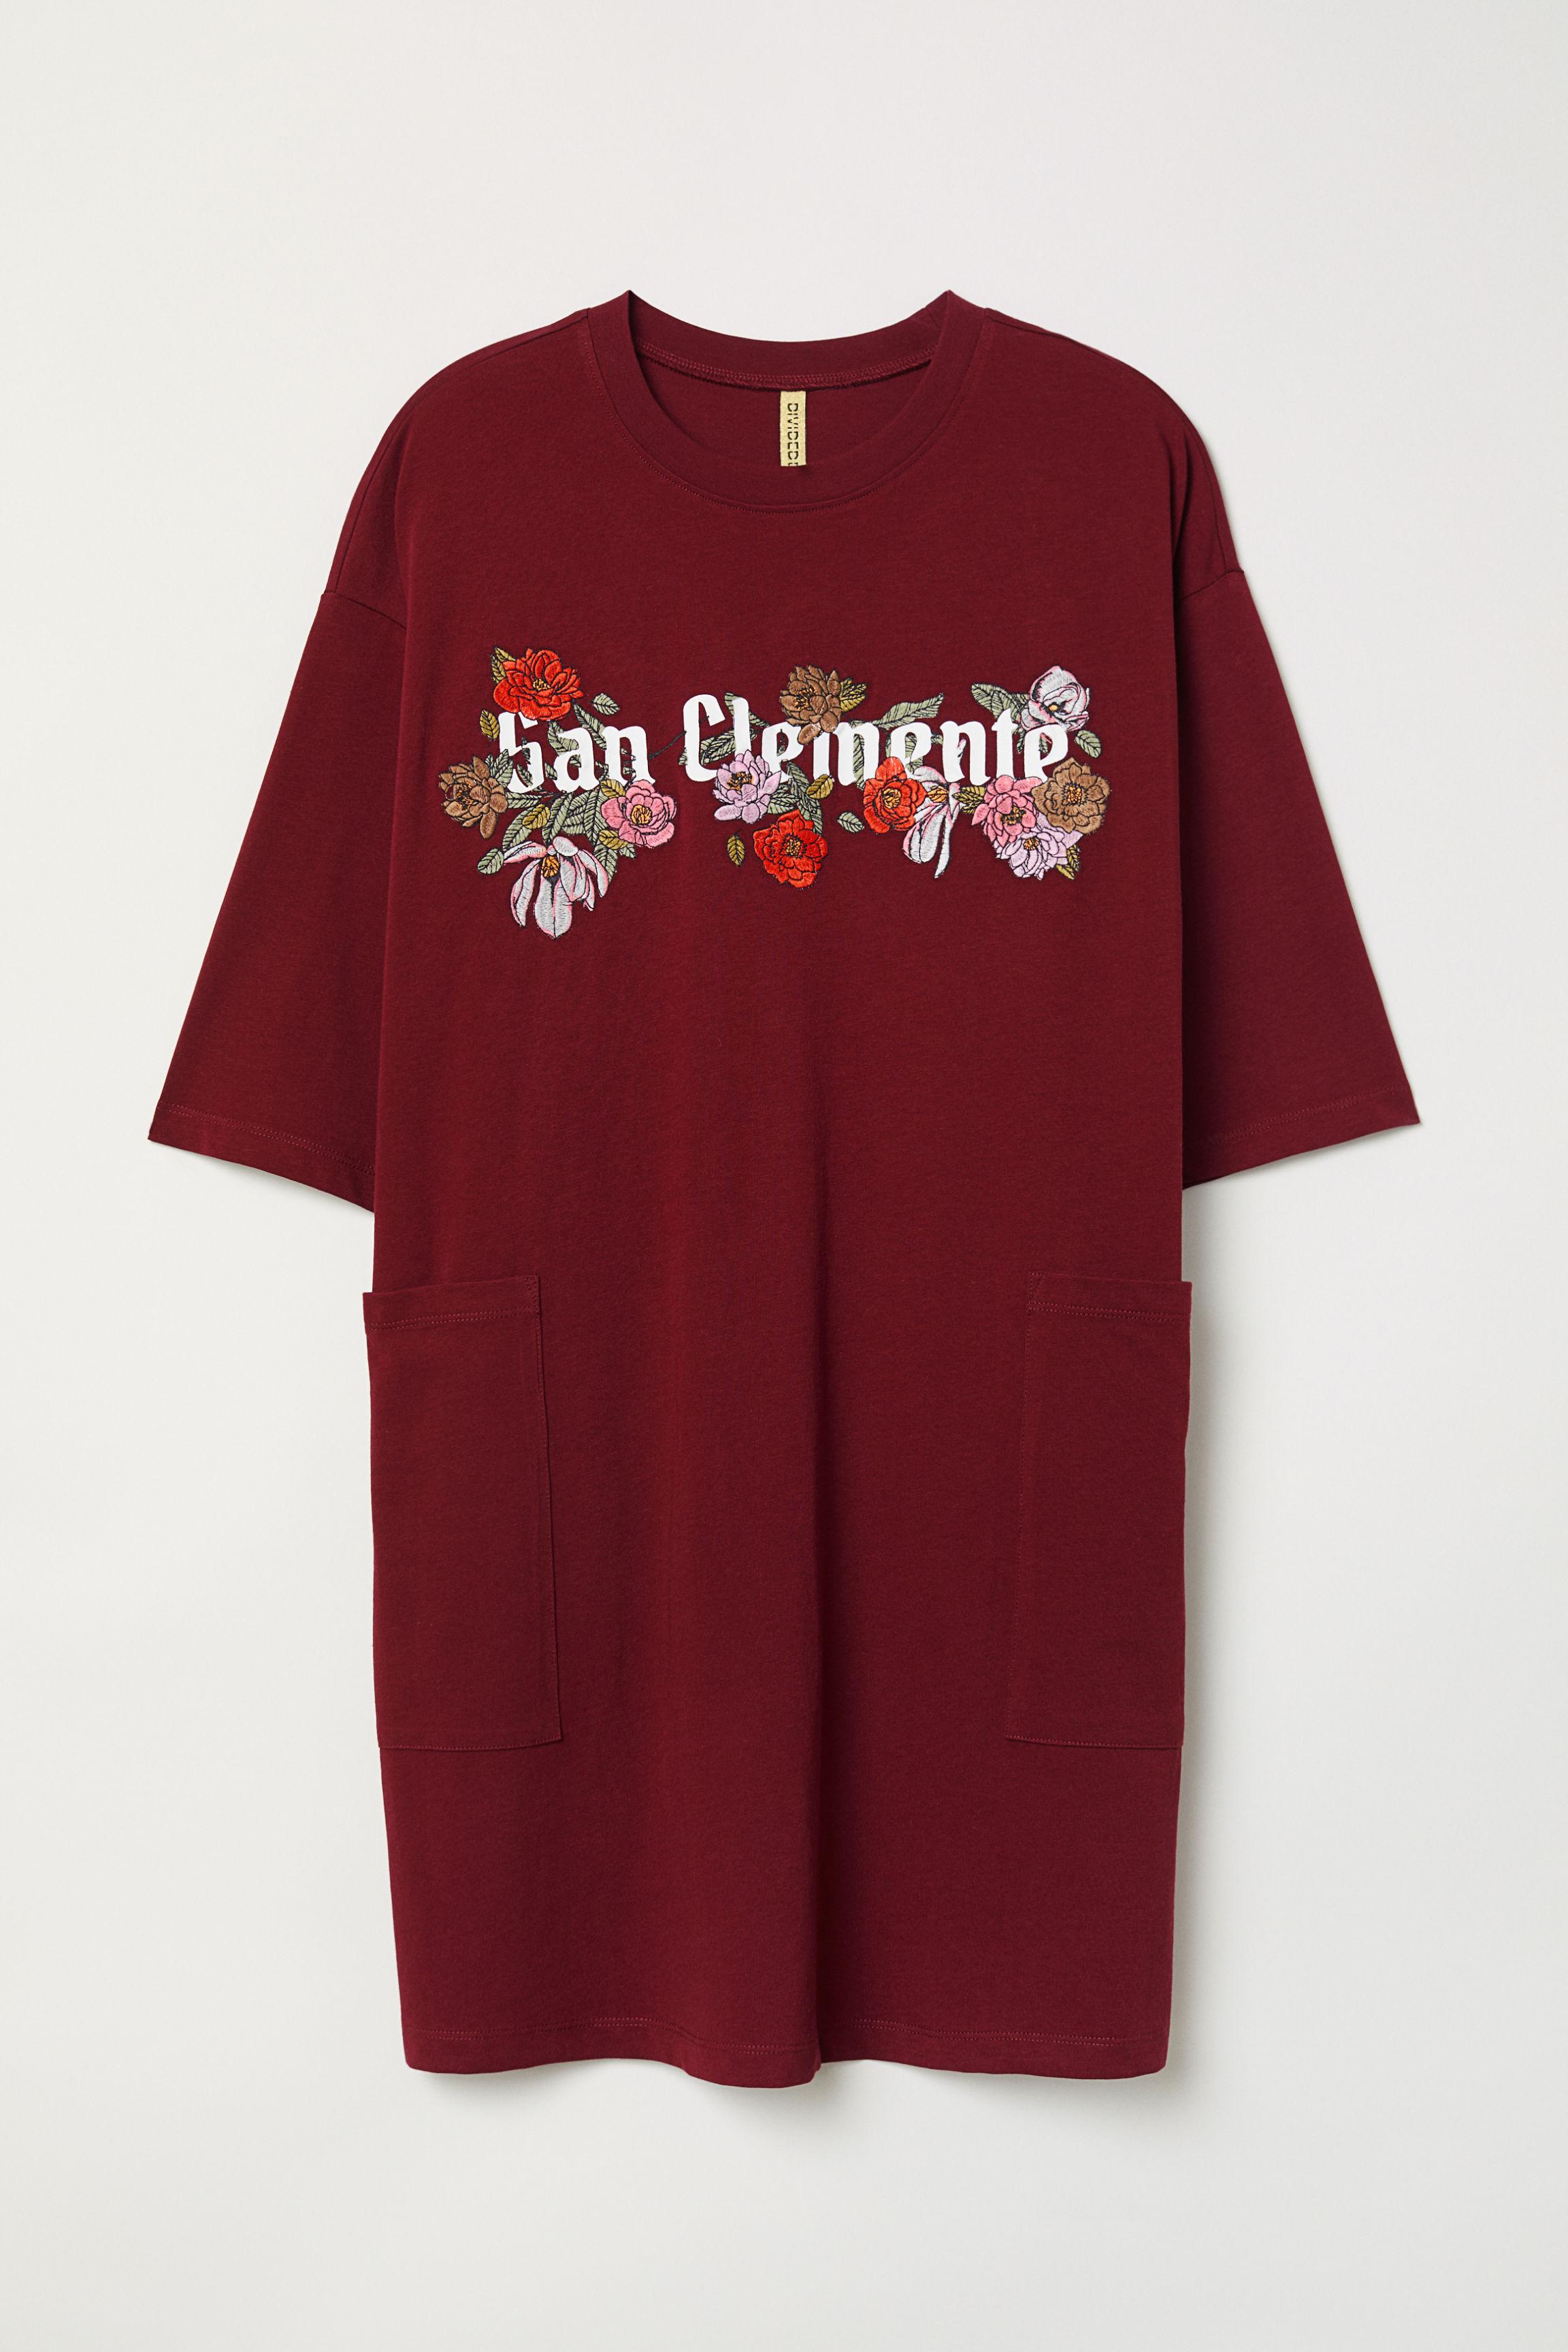 c7e376f4 Oversized T-shirt Dress - Burgundy/flowers - | H&M US